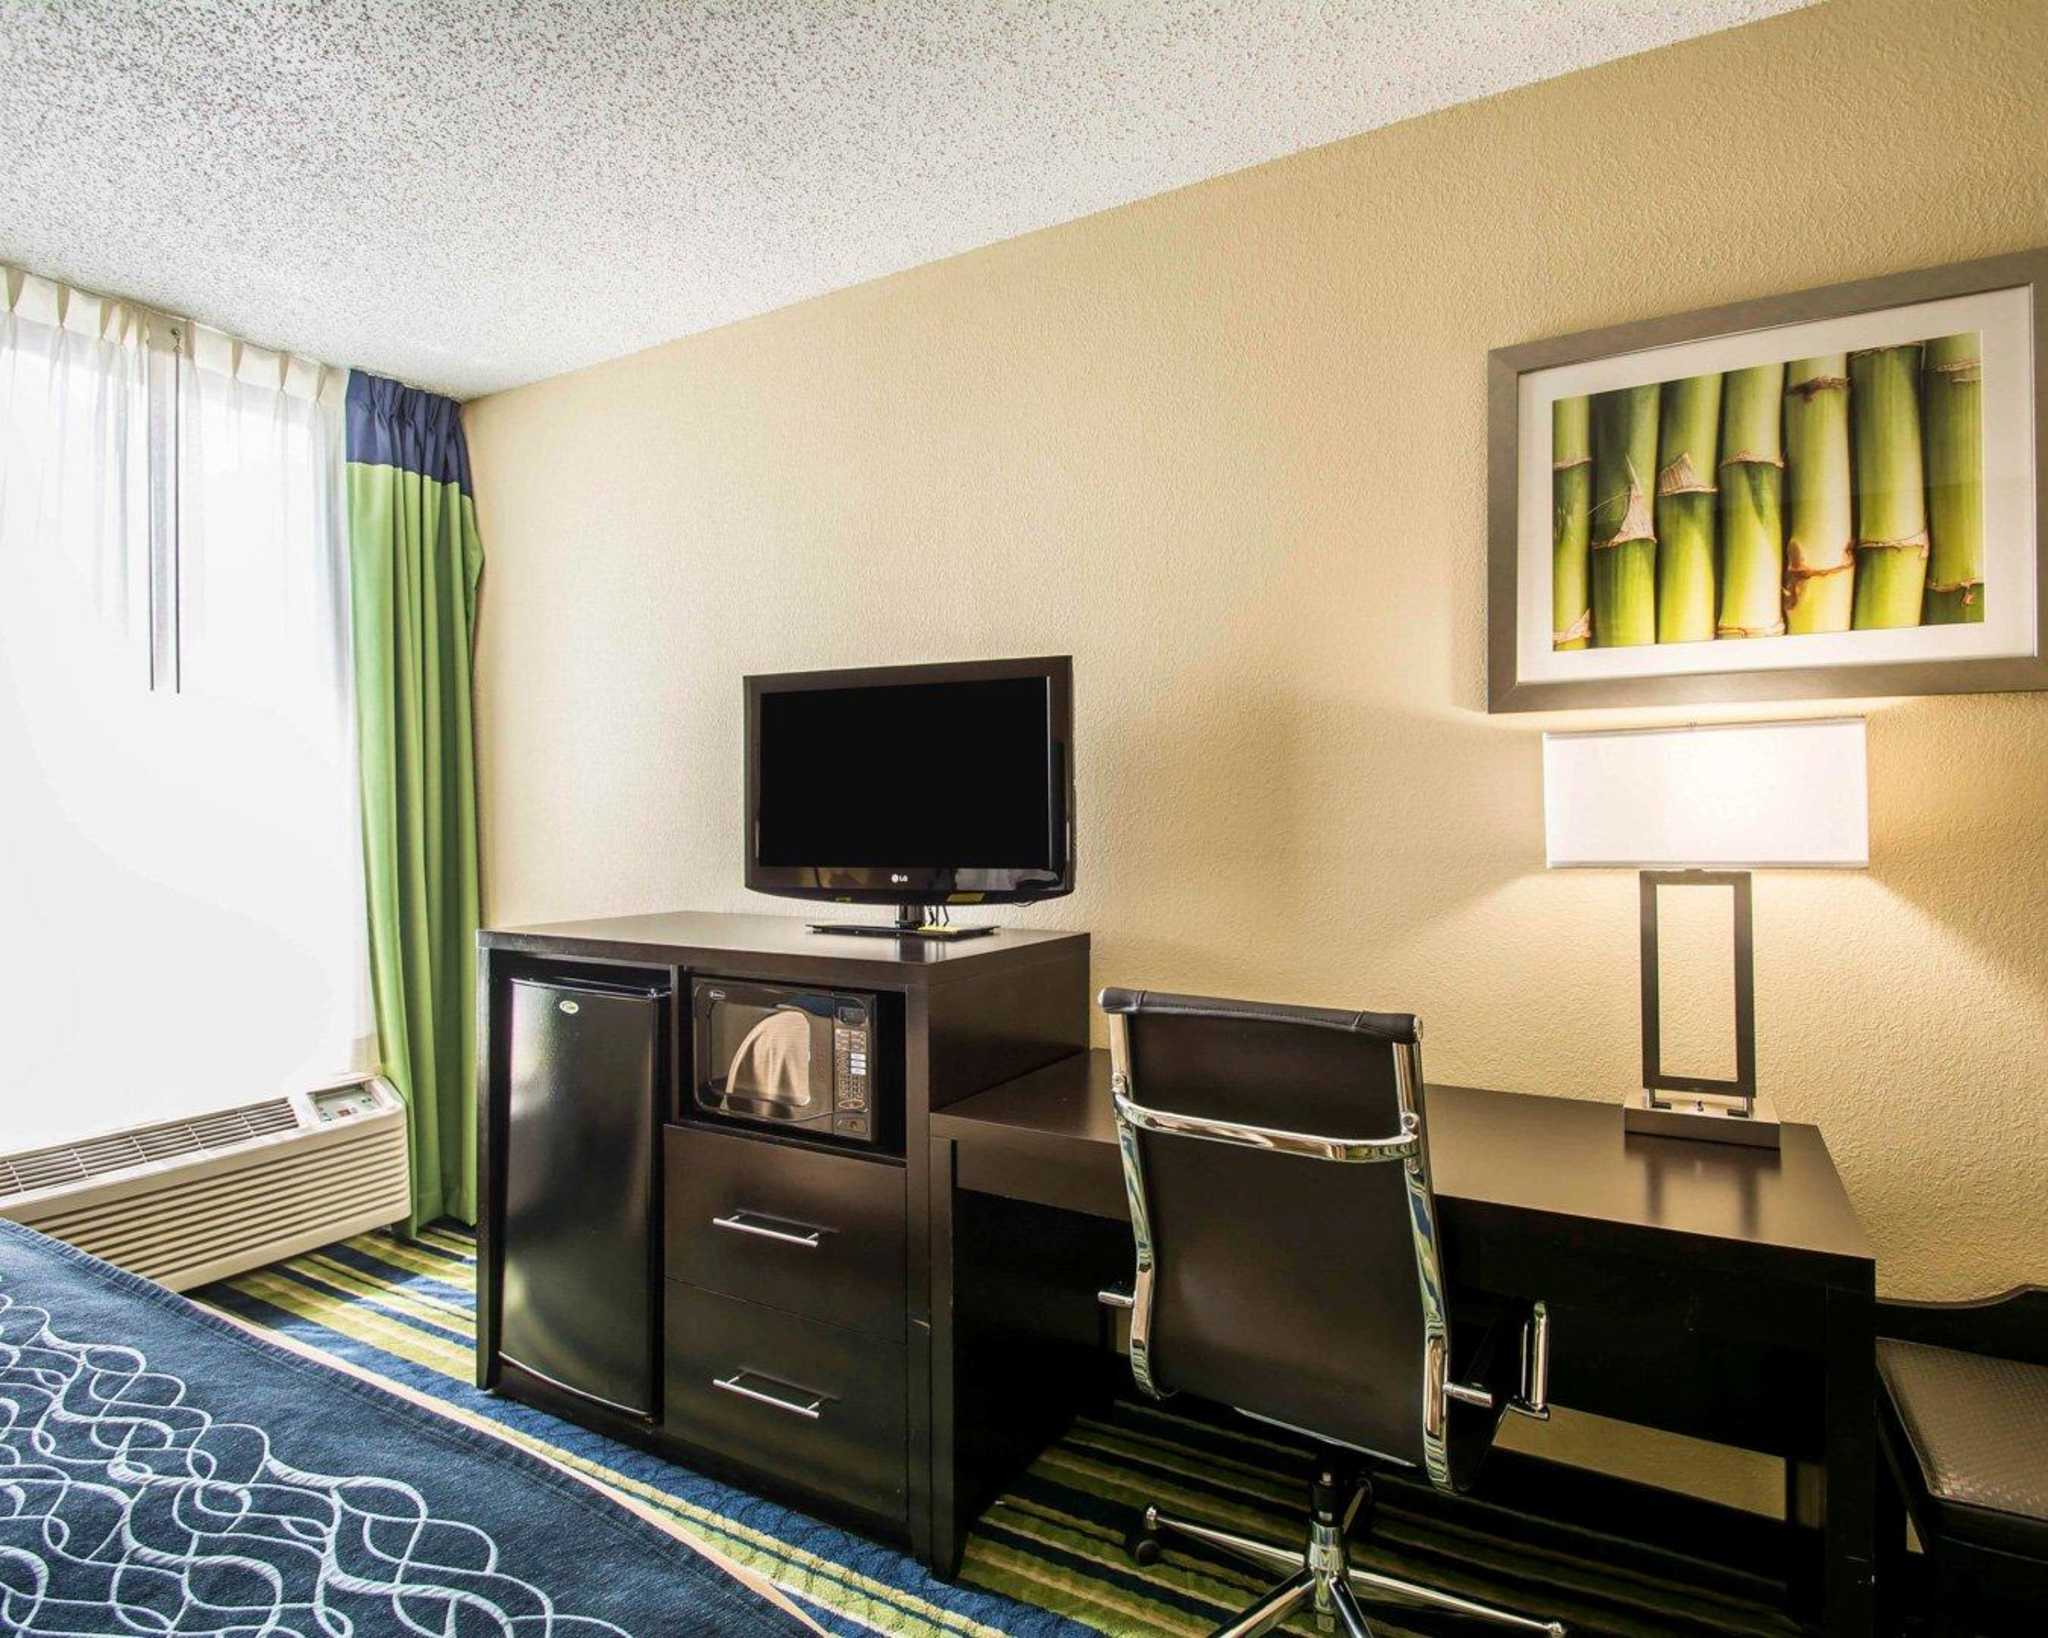 Comfort Inn & Suites Lantana - West Palm Beach South image 5